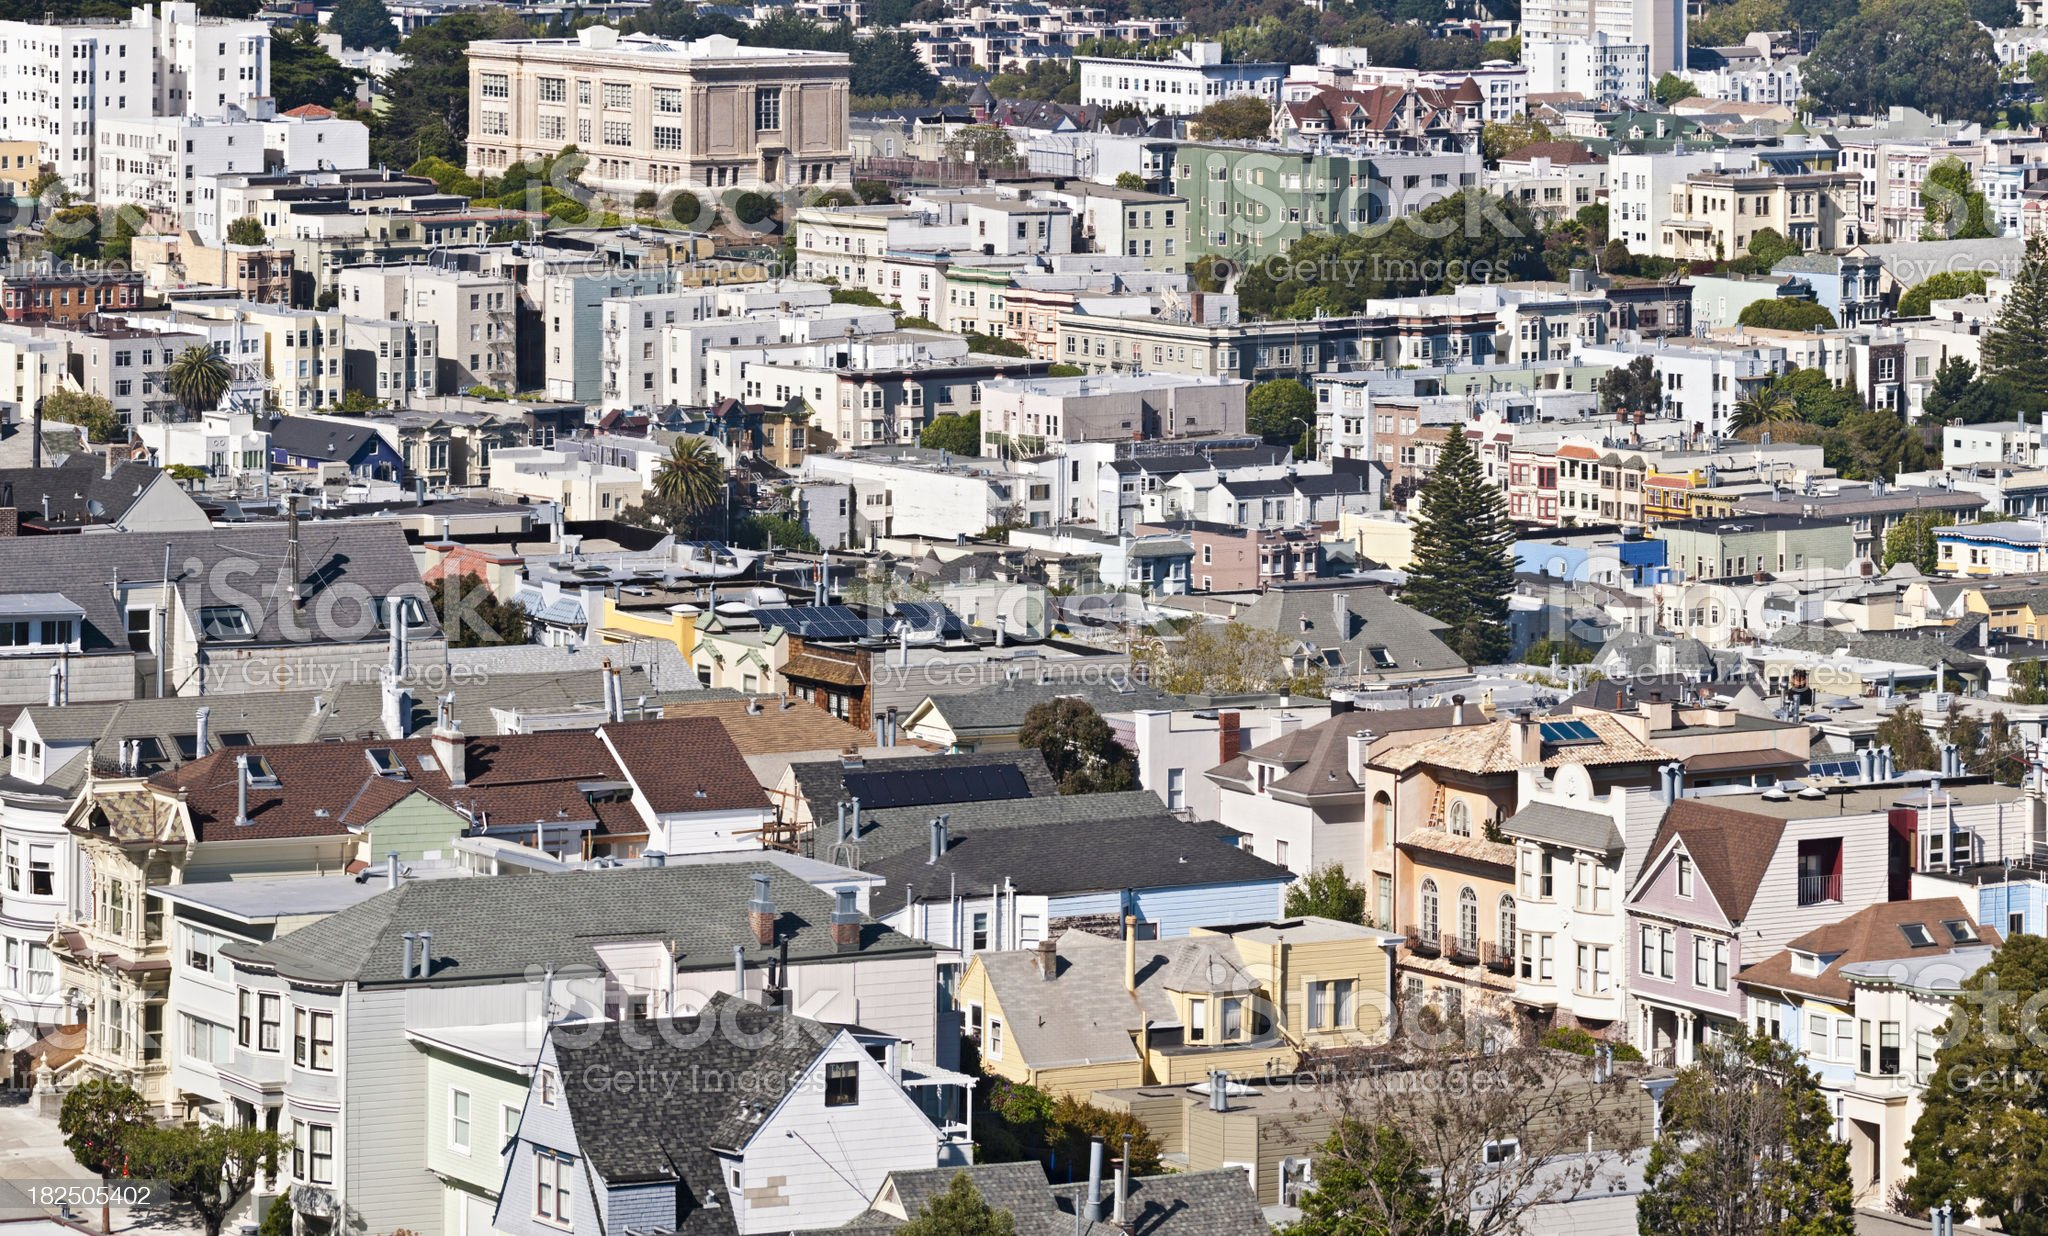 San Francisco rooftop cityscape houses streets crowded urban blocks California royalty-free stock photo